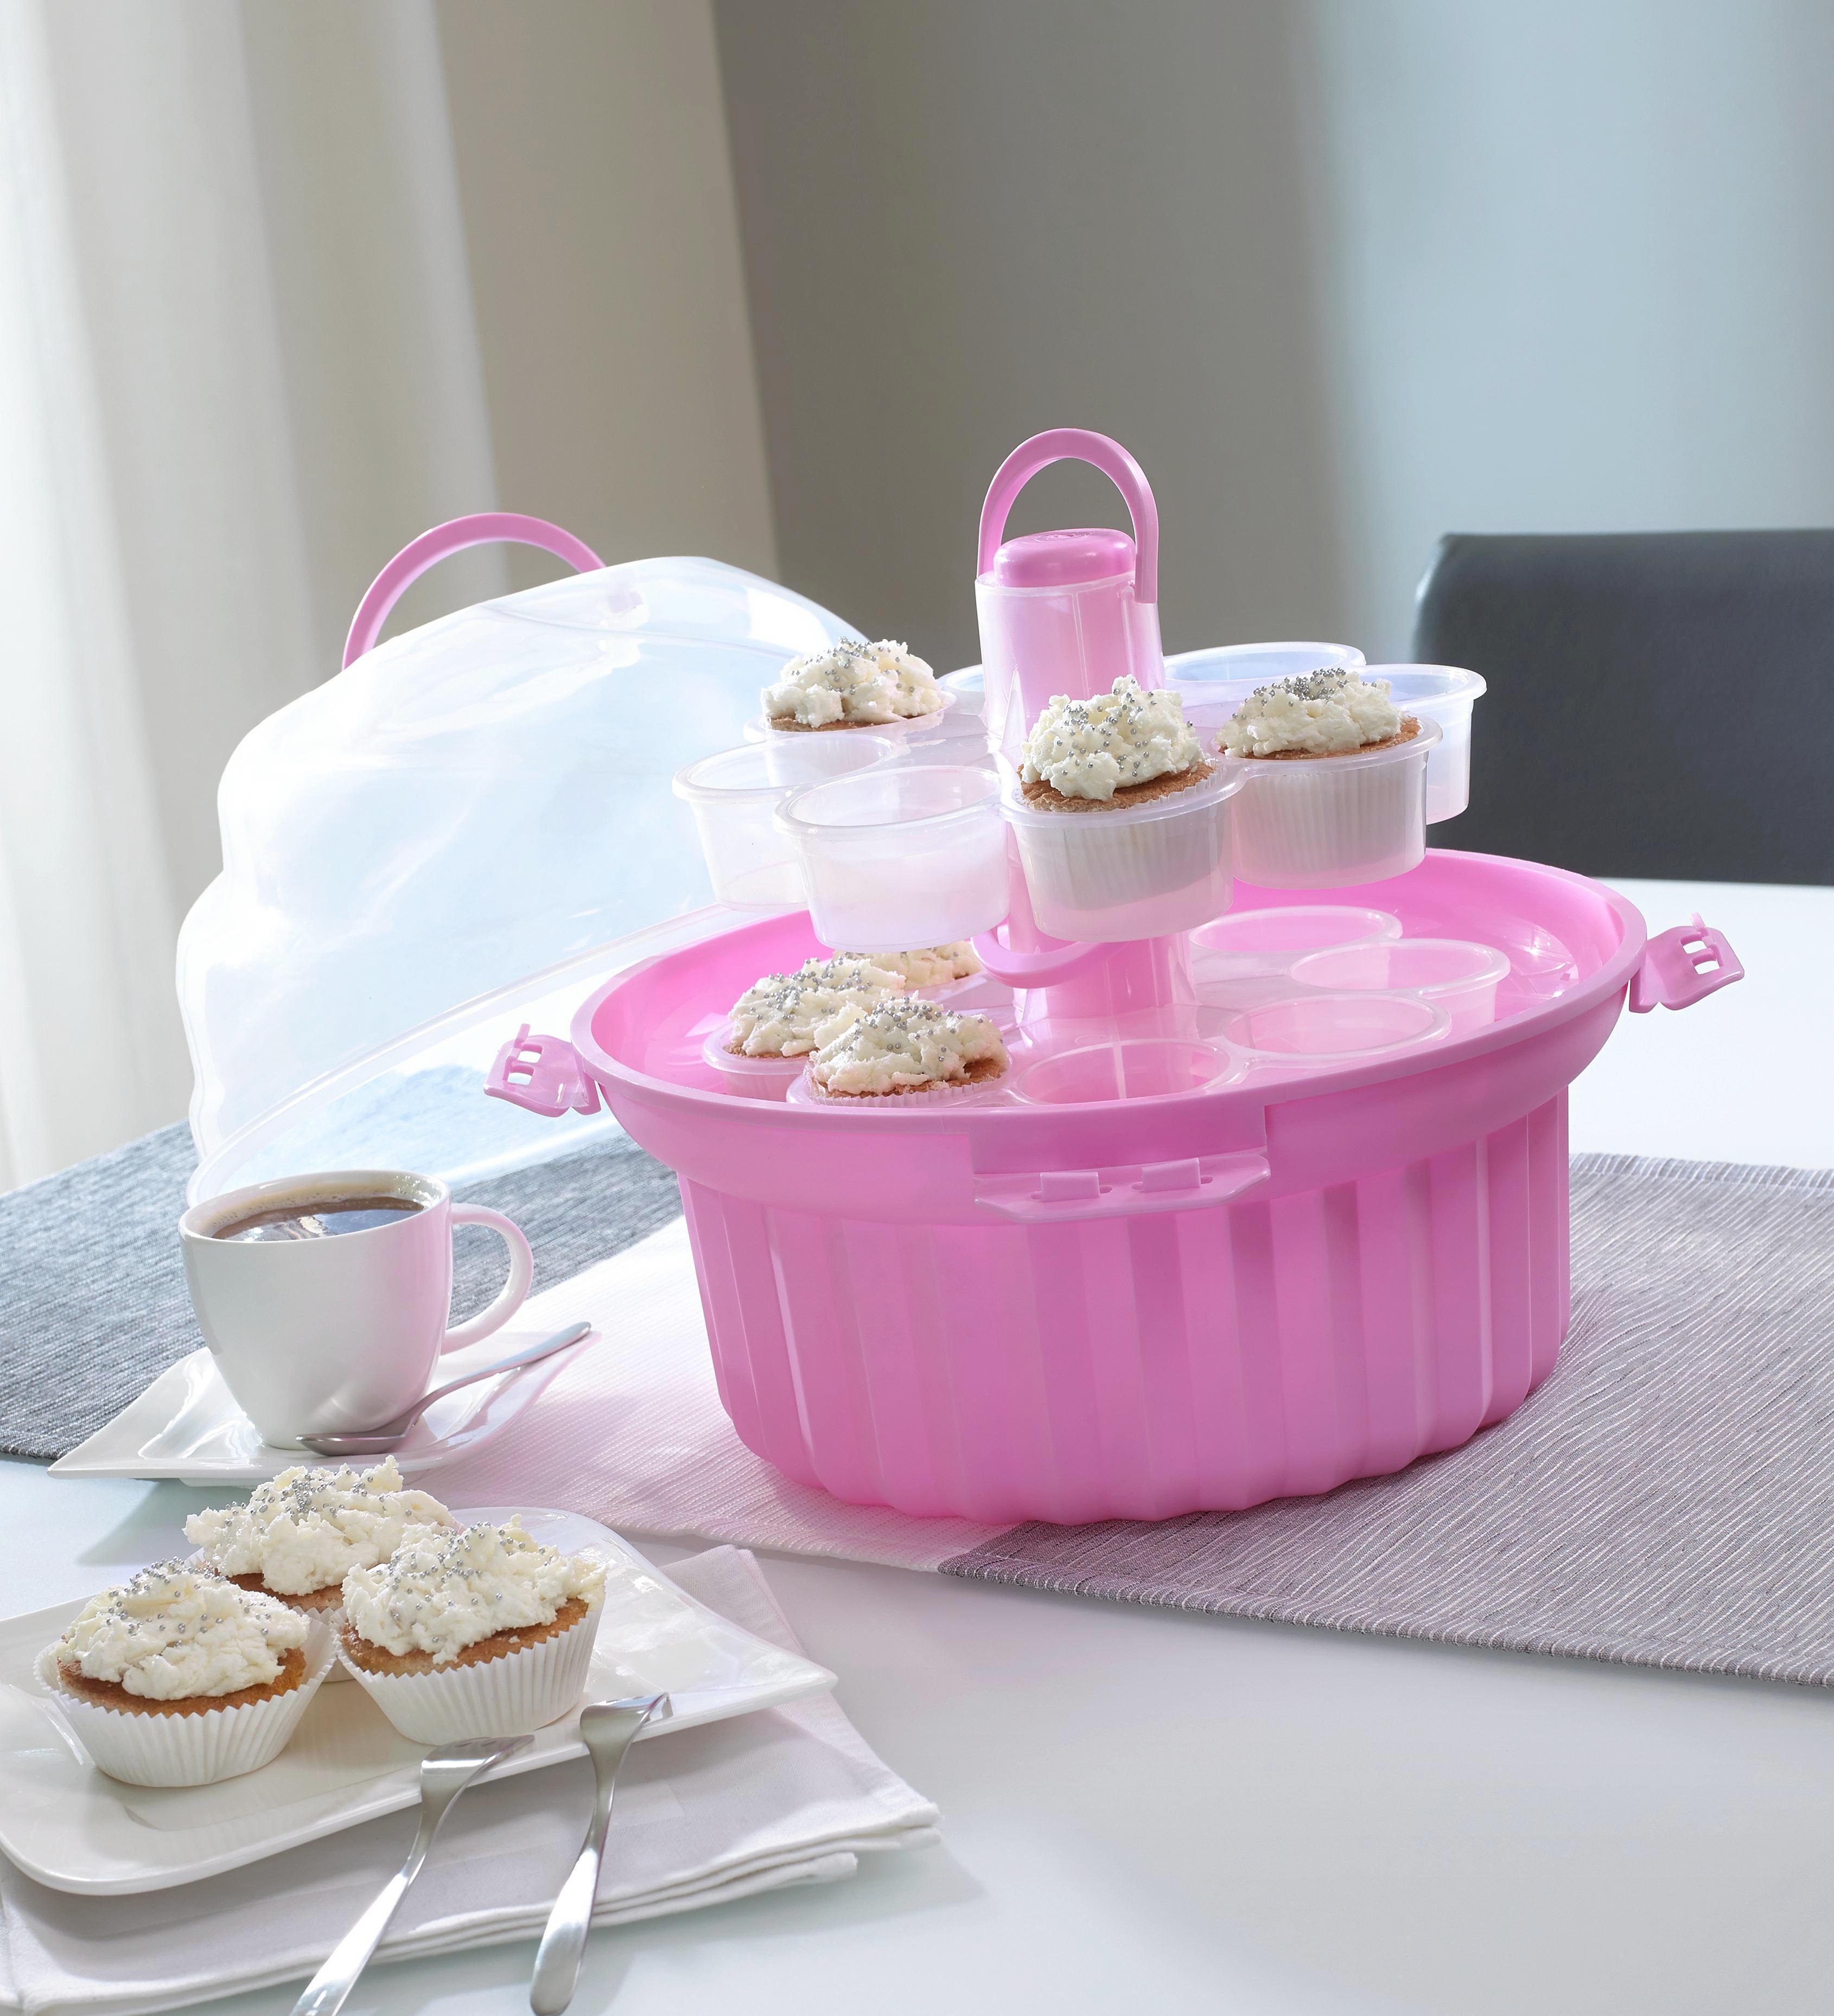 CUPCAKE-STÄNDER - Pink/Transparent, Basics, Kunststoff (33/28cm) - HOMEWARE